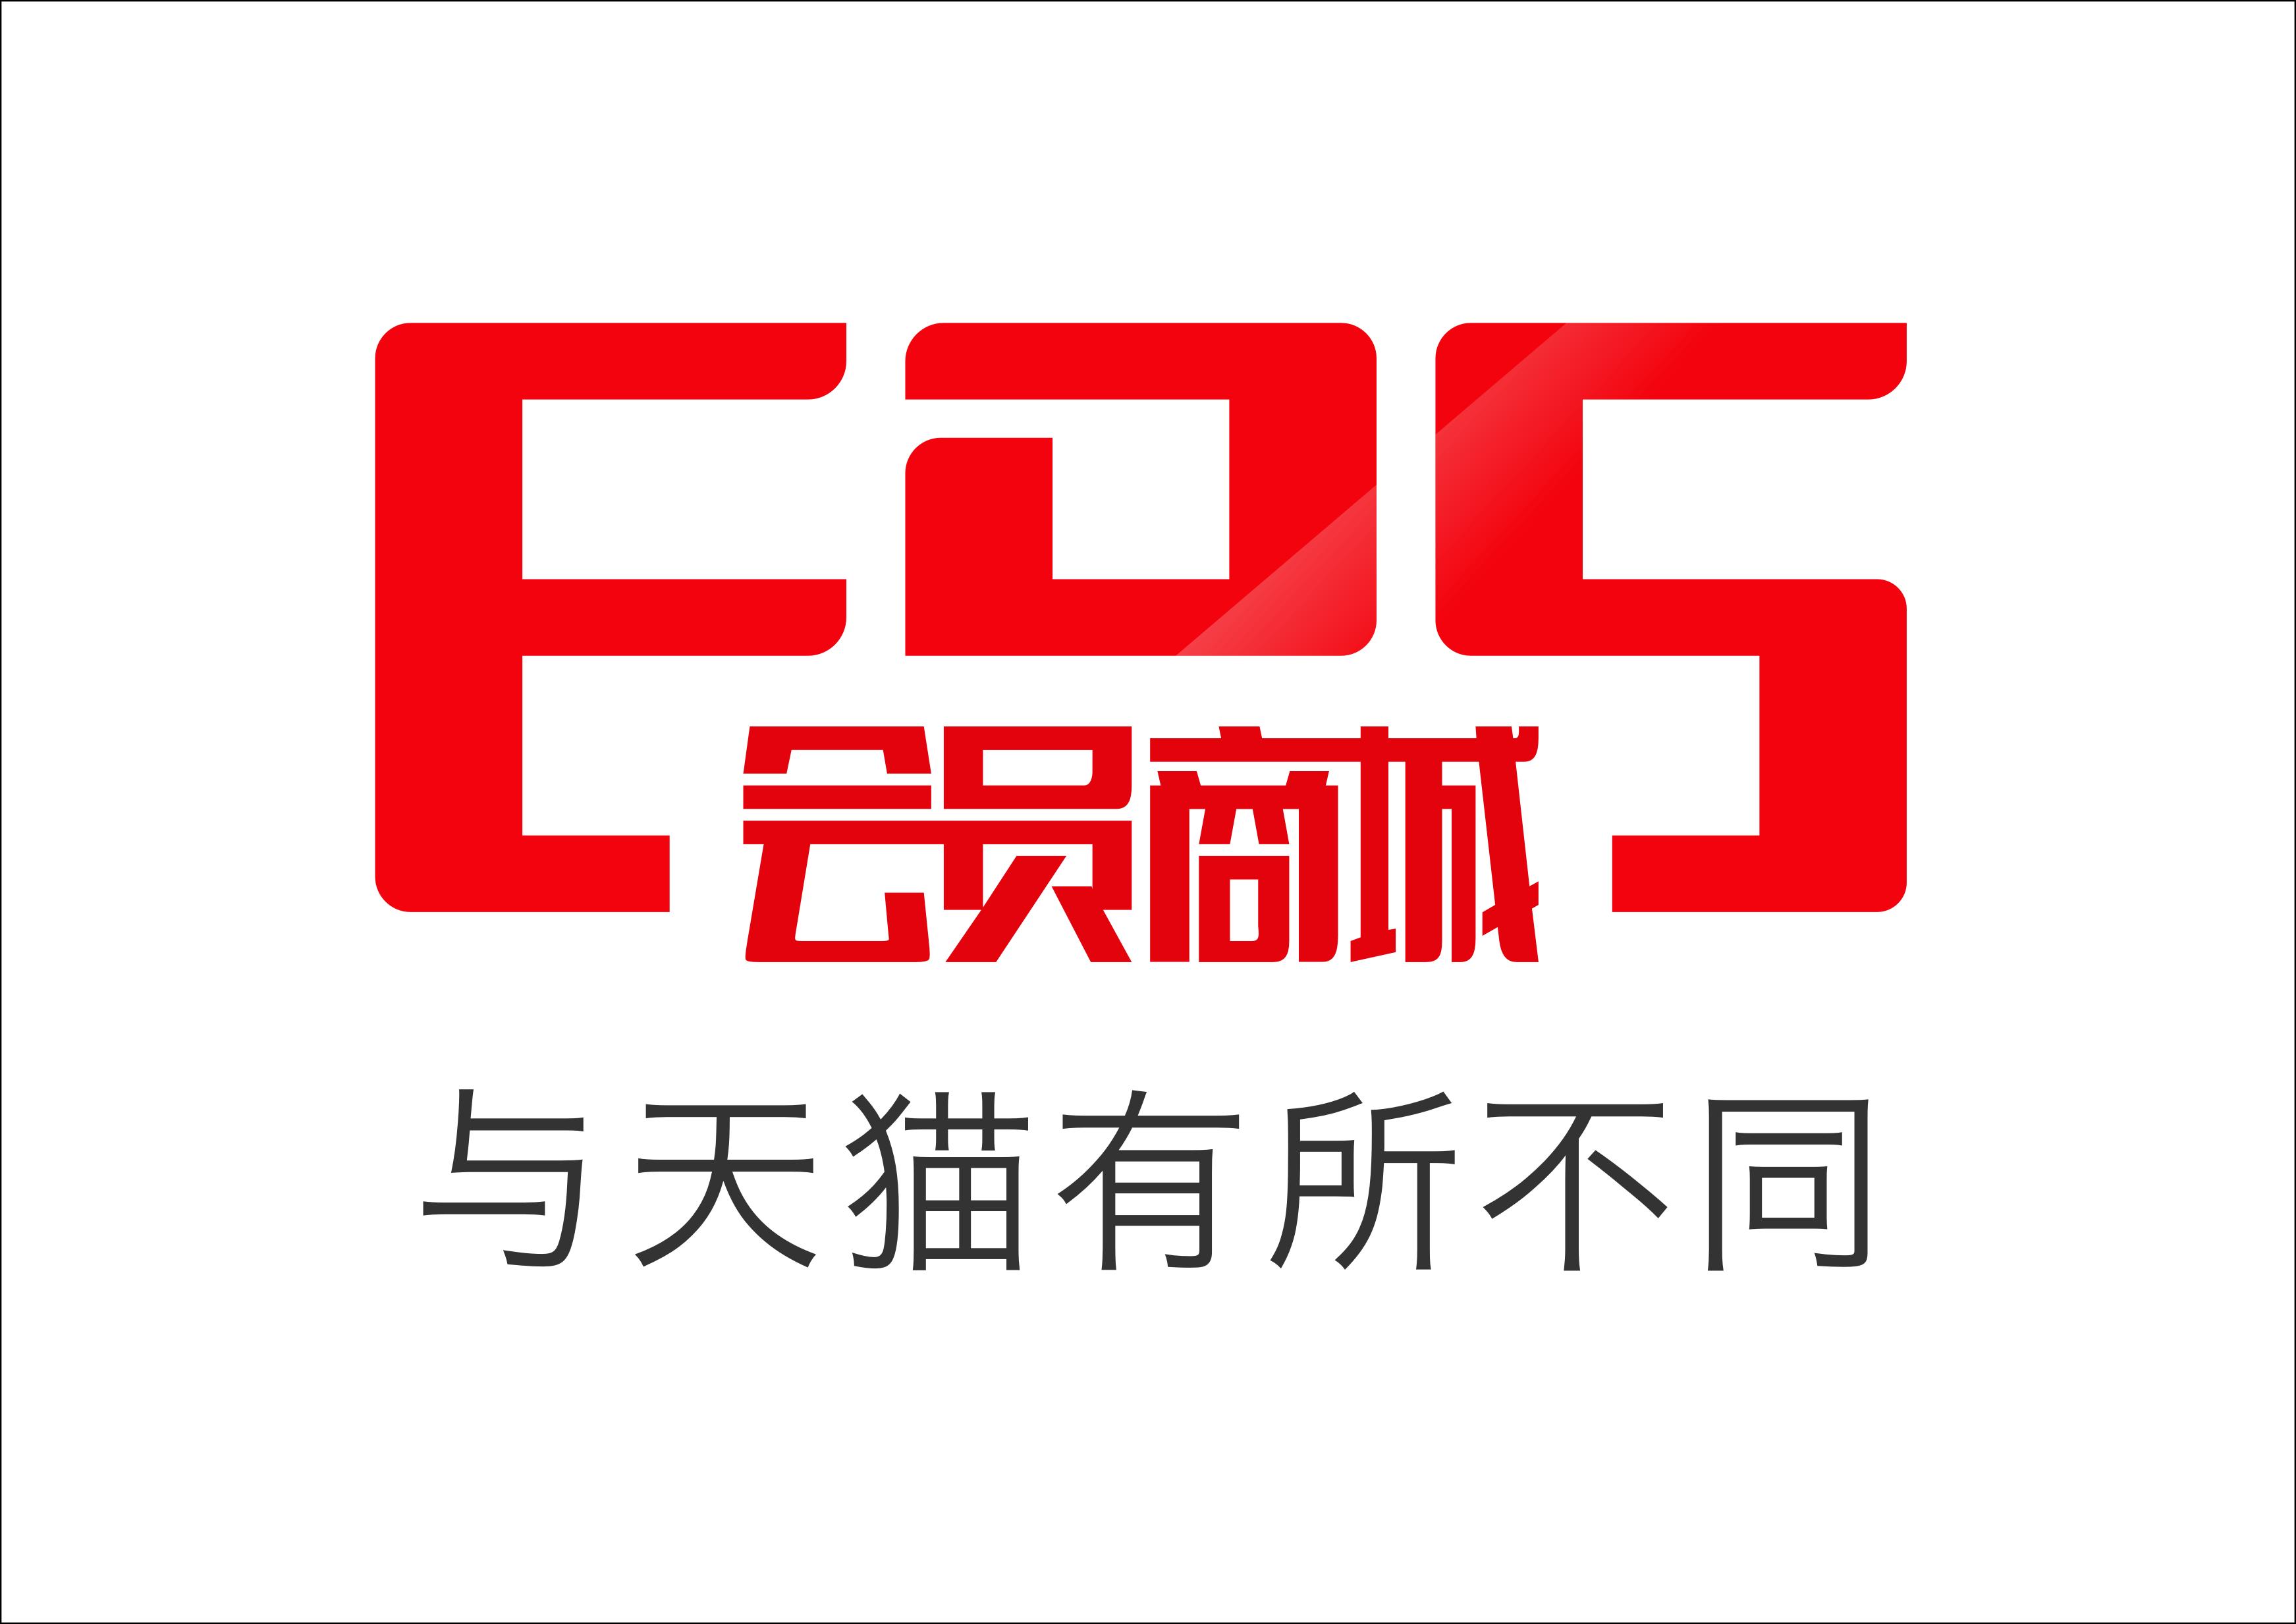 EDS商城广告语及LOGO(标准版)0